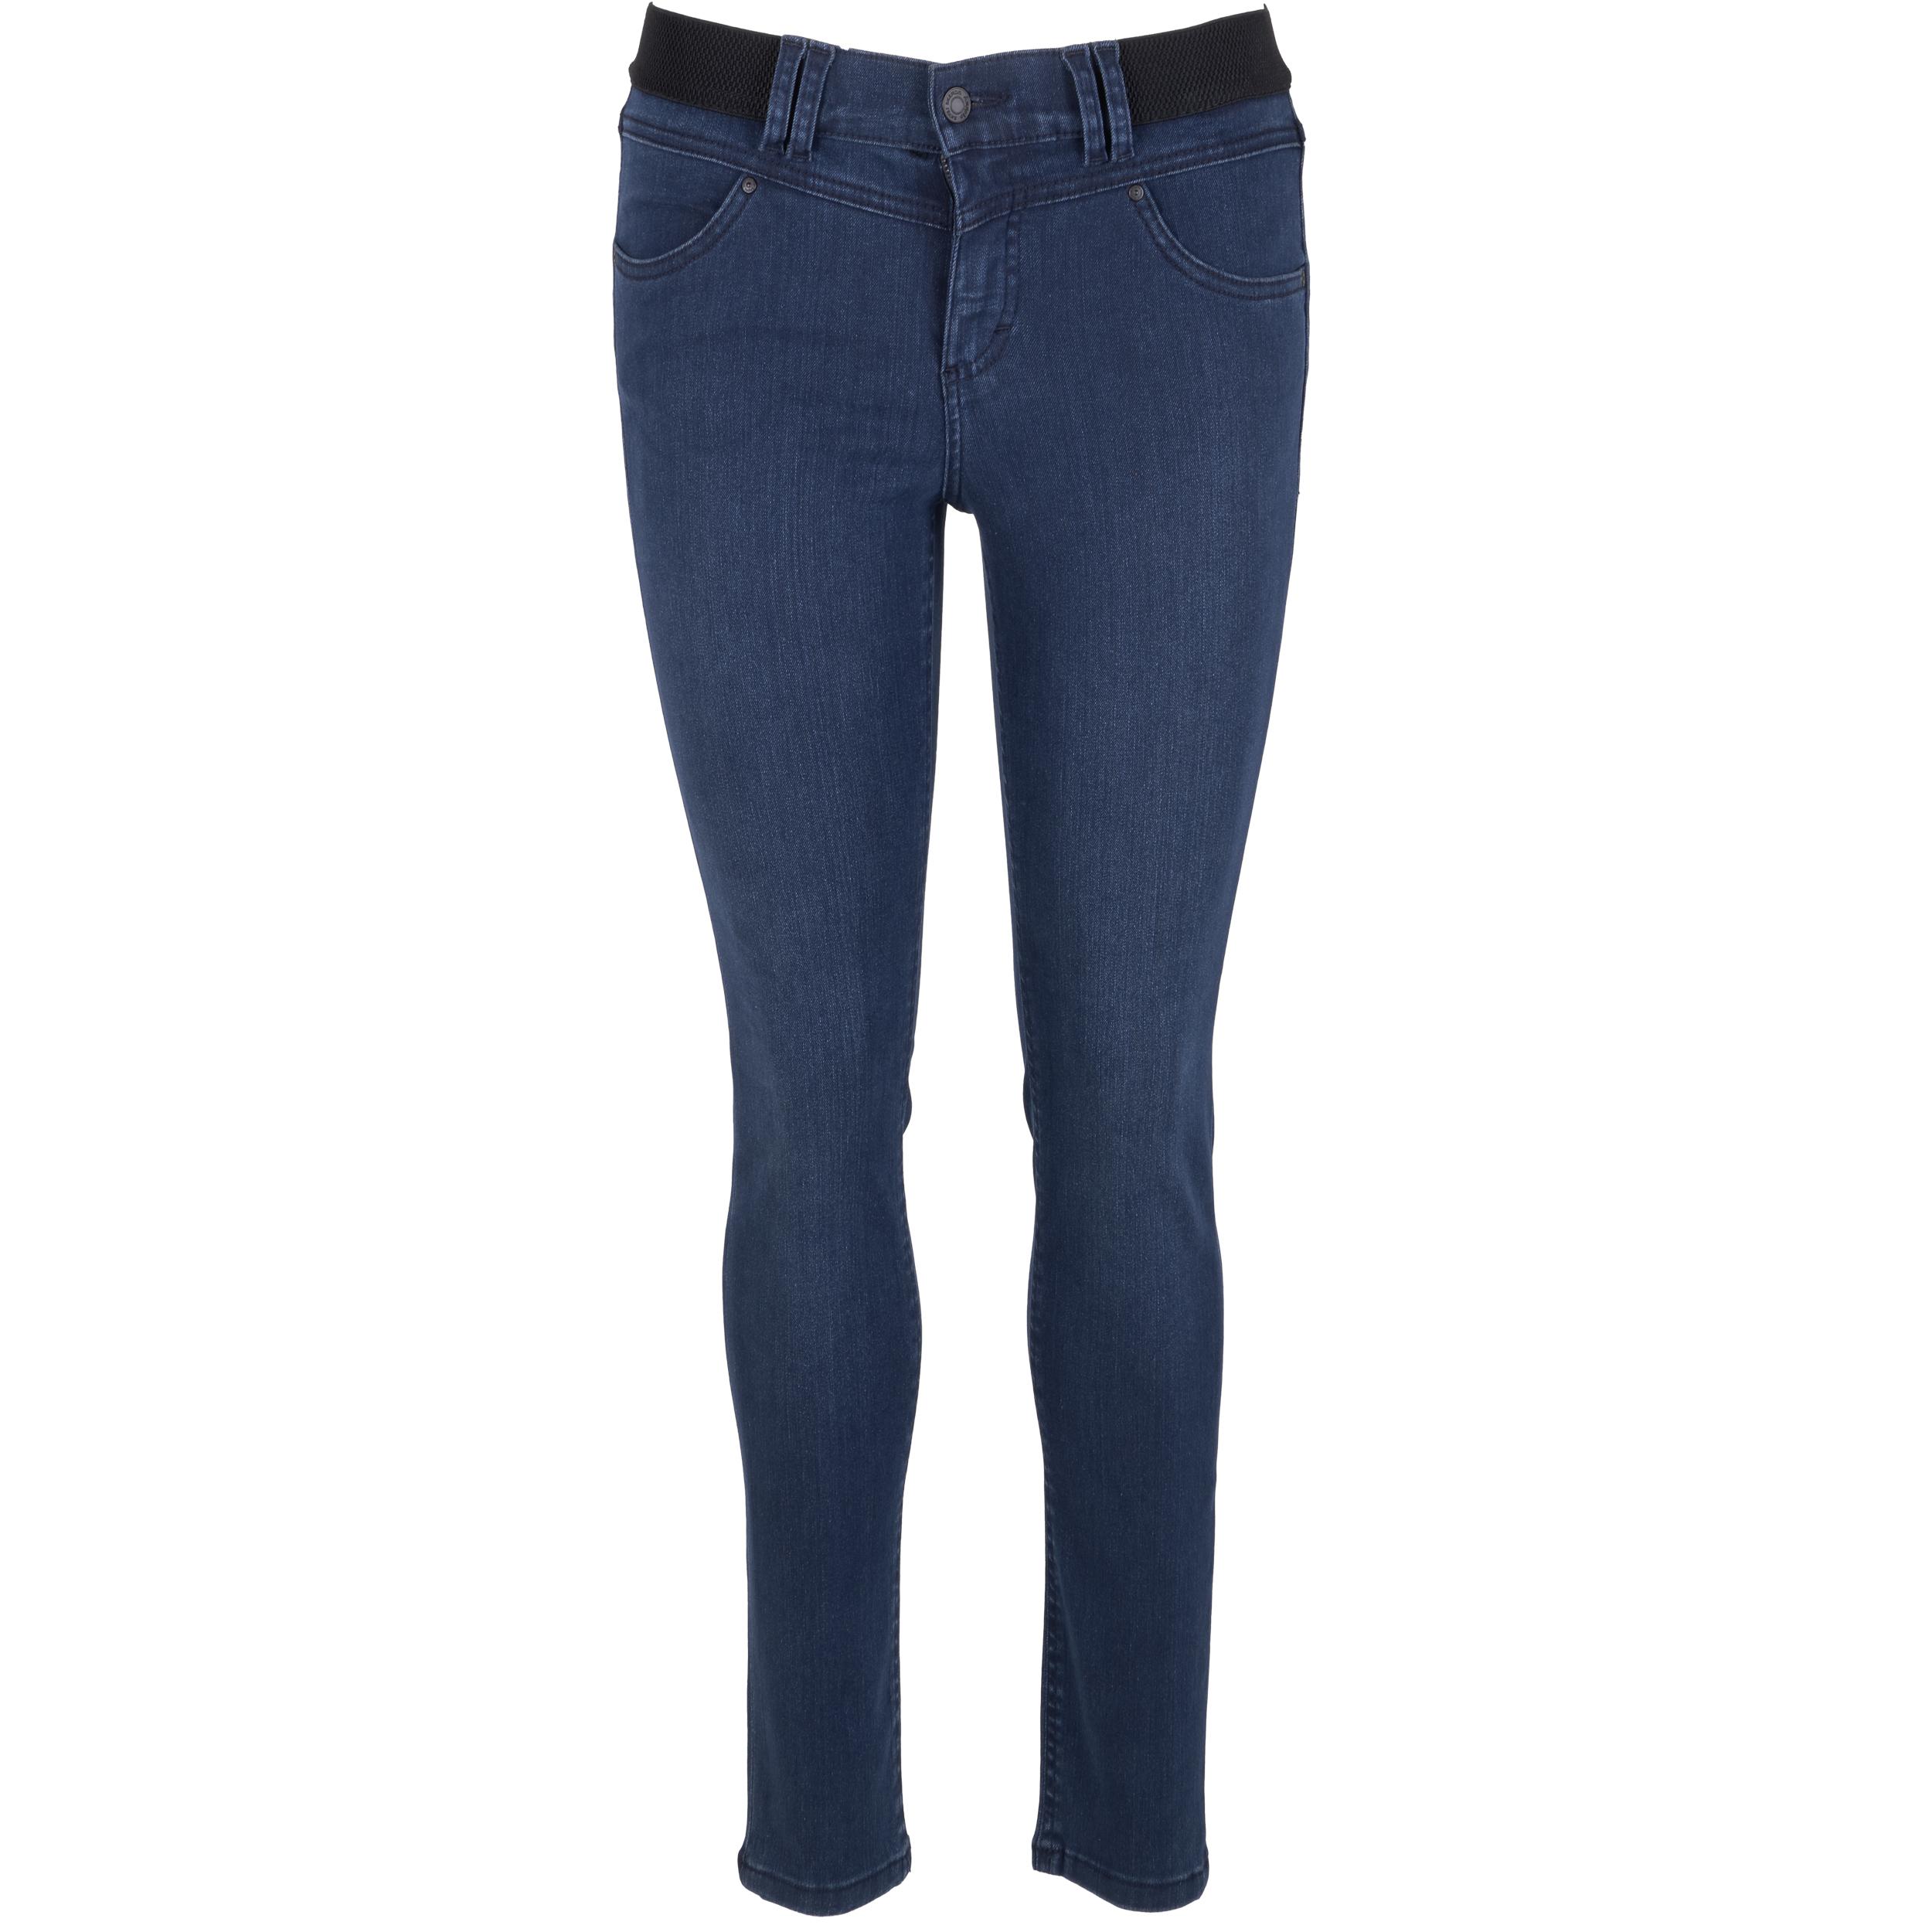 Angels Damen Jeans One Size authentic - dunkelblau